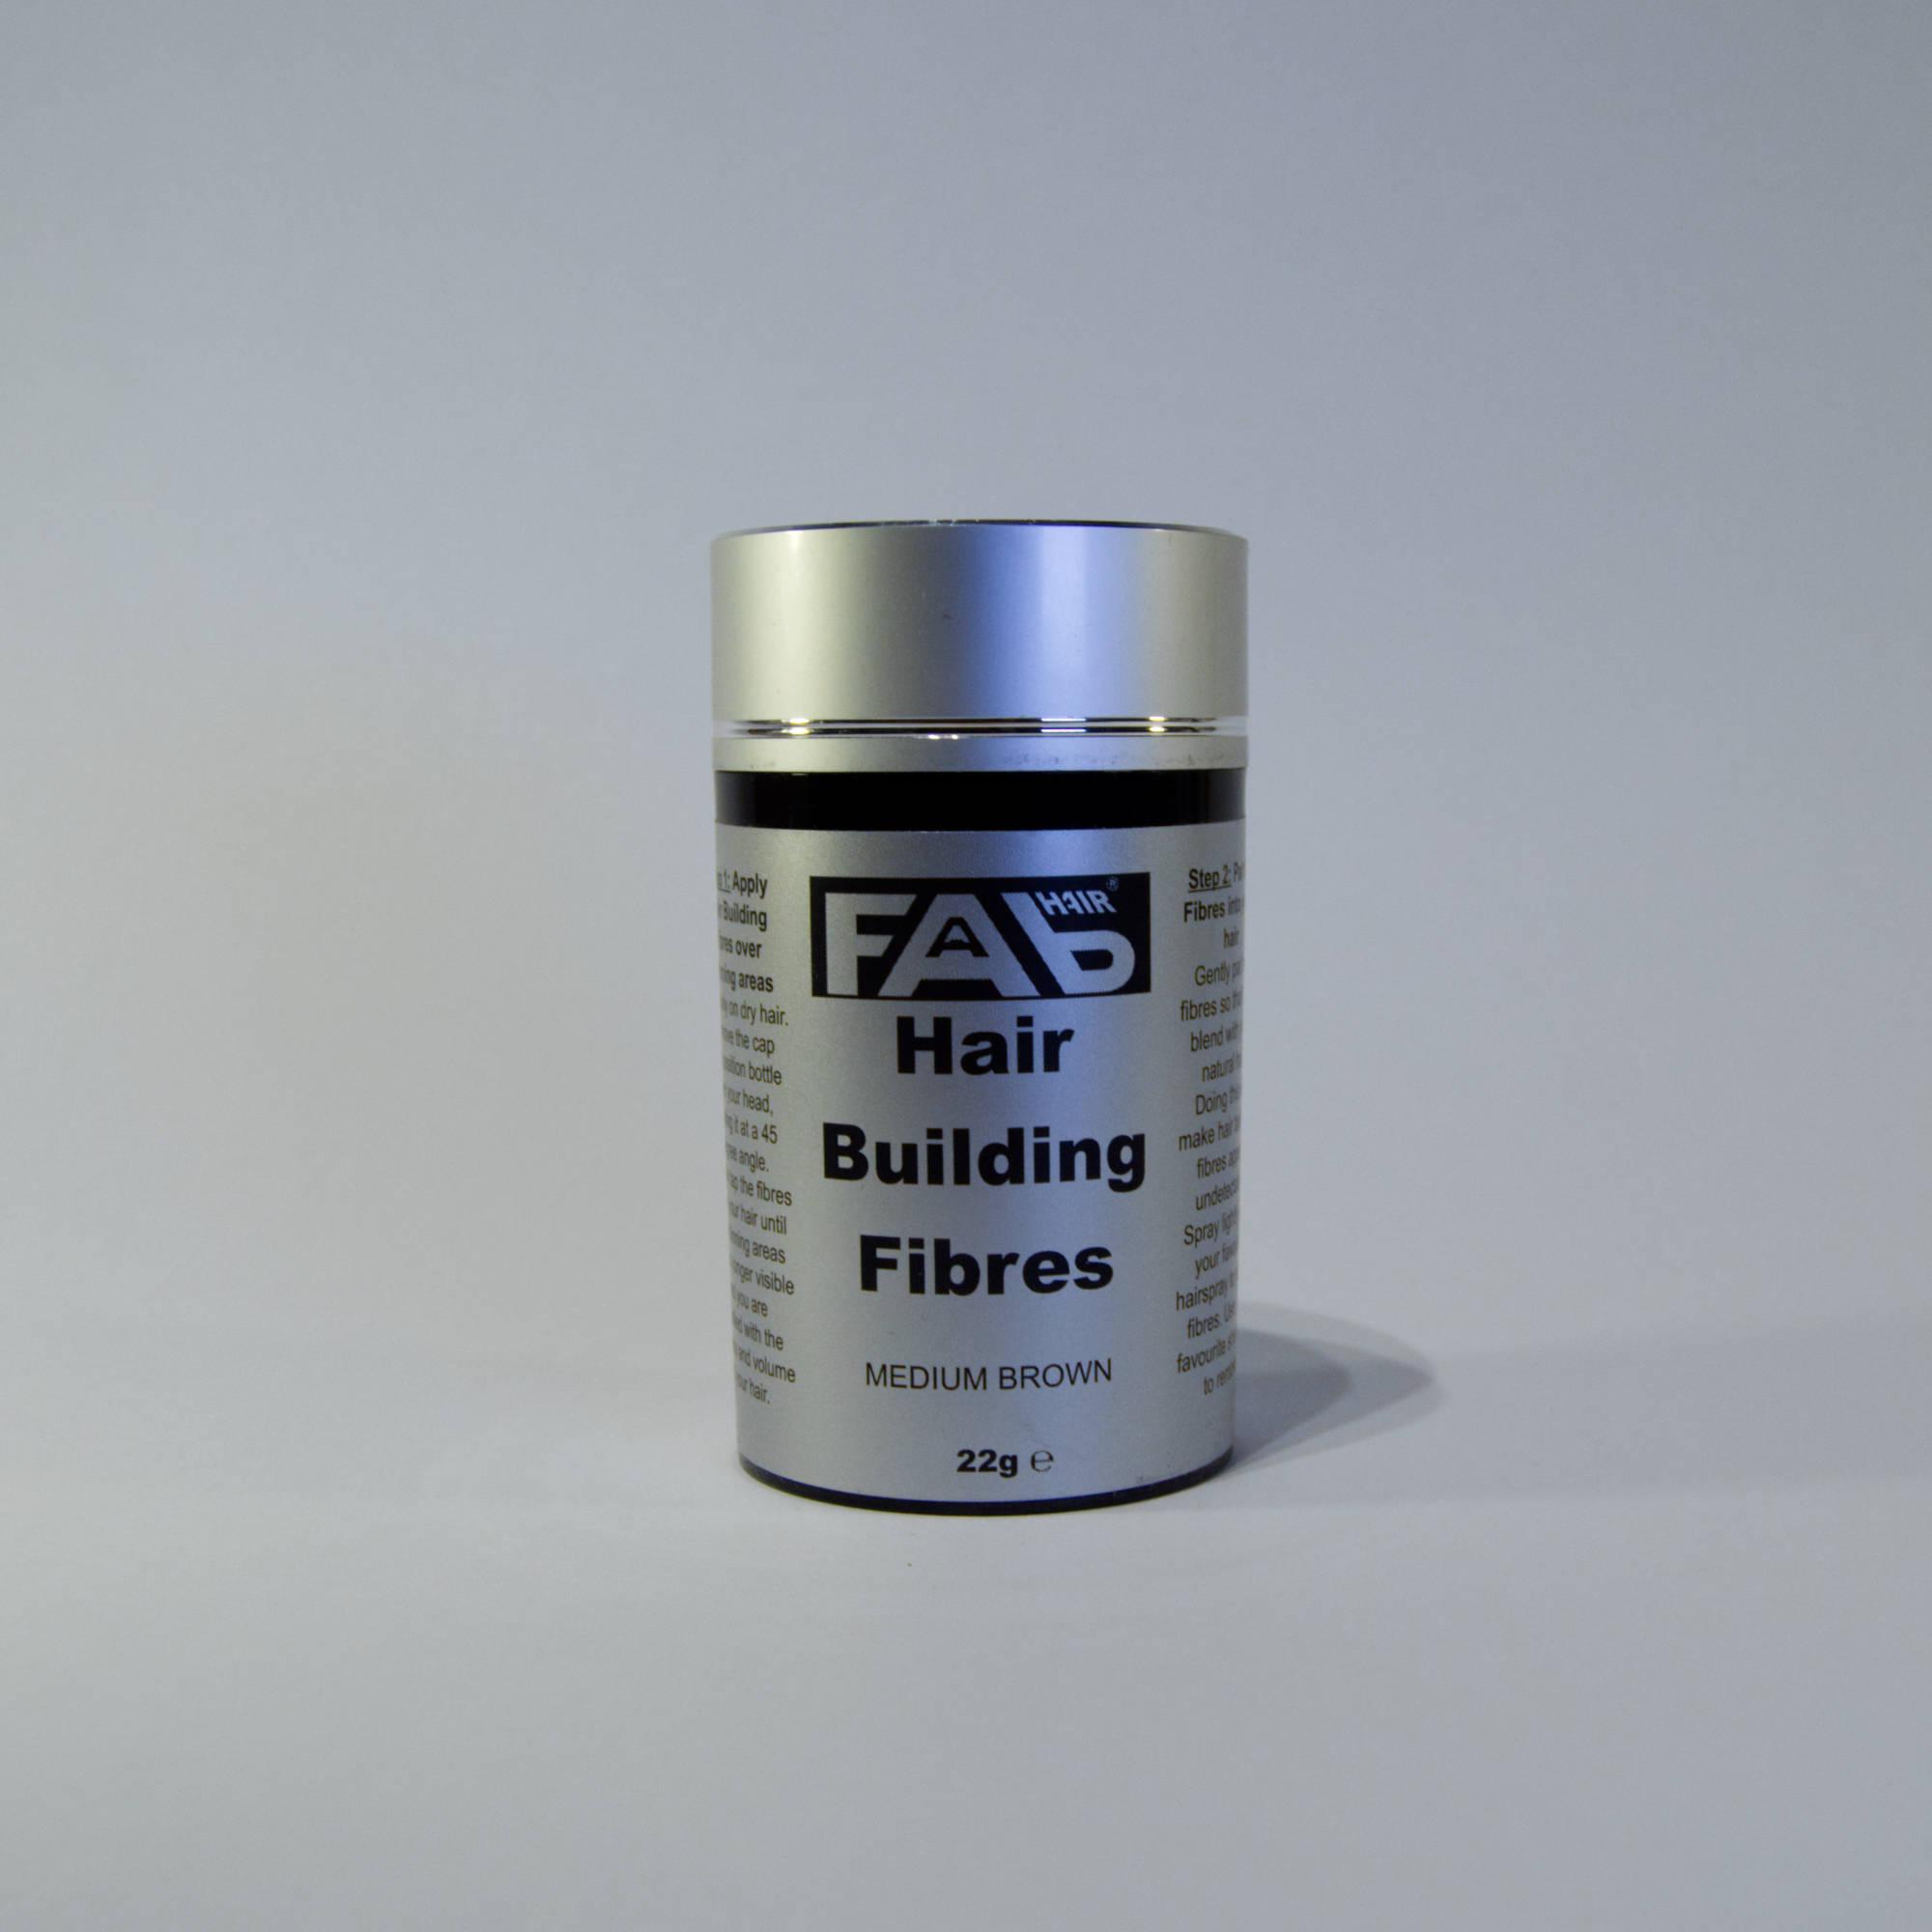 Medium Brown variety of FAB Hair Building Fibres